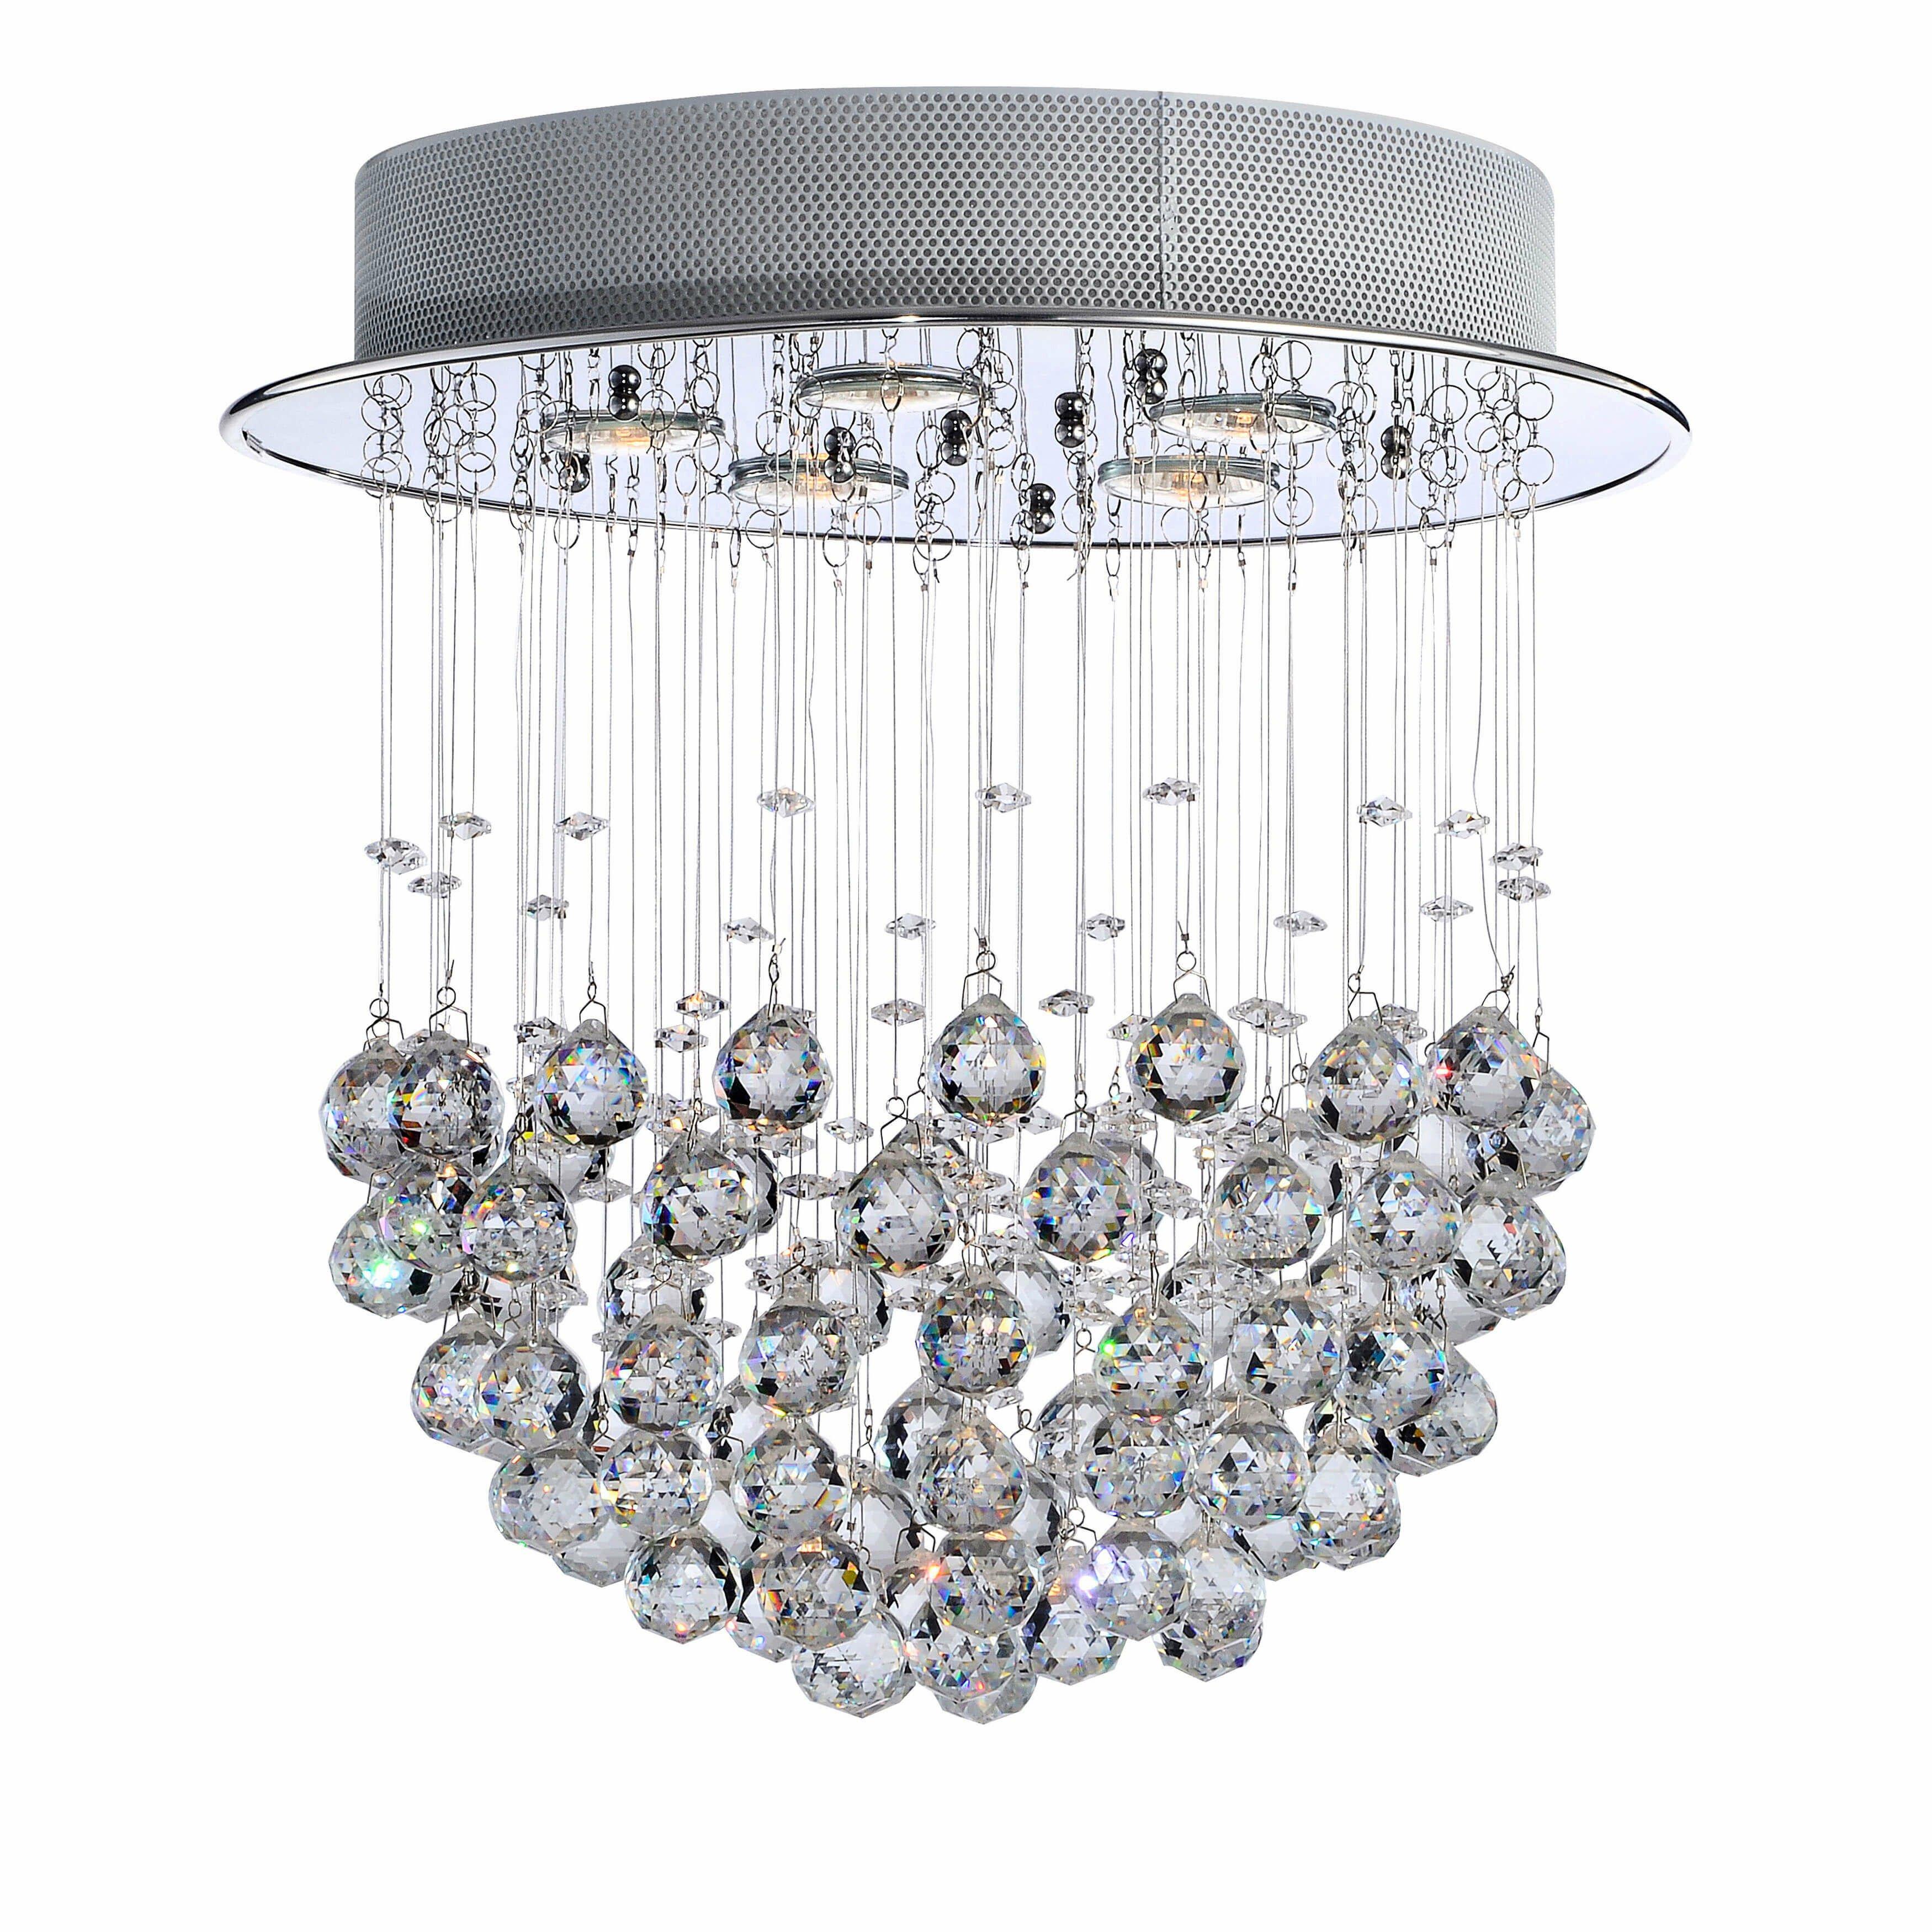 Little Girl Chandelier Bedroom Unique Fayetteville Crystal 5 Light Flush Mount